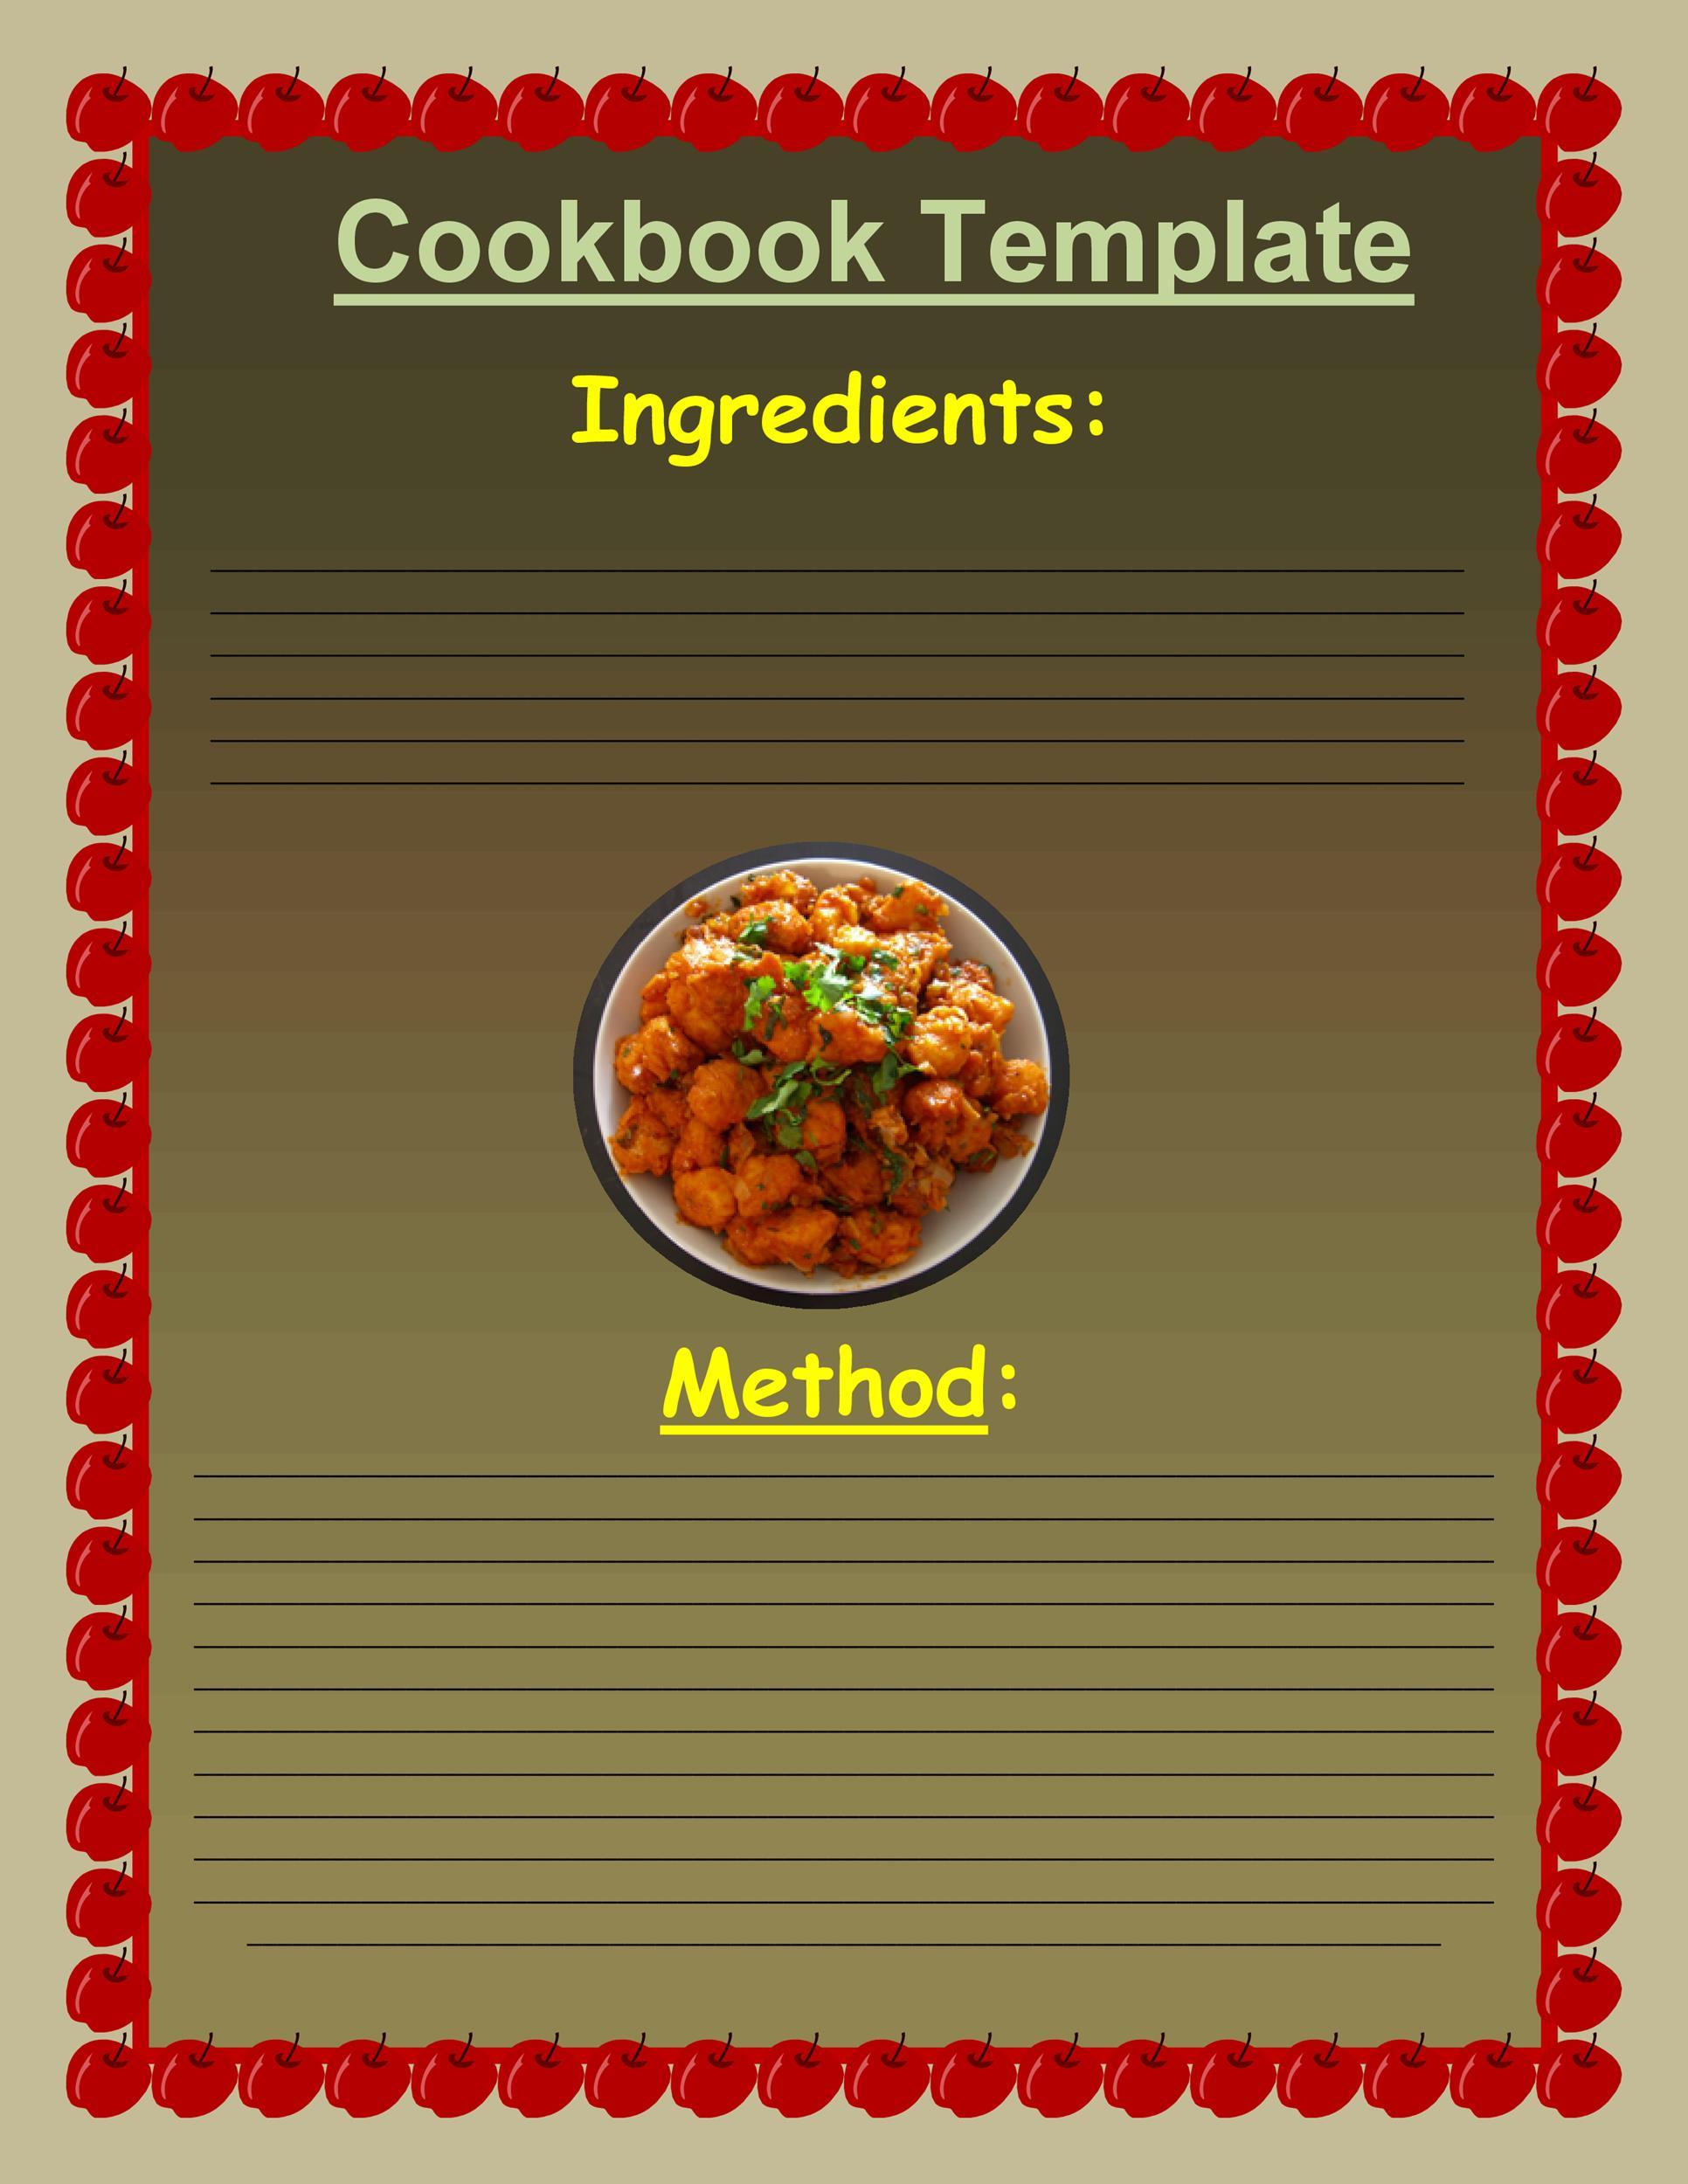 Free cookbook template 32